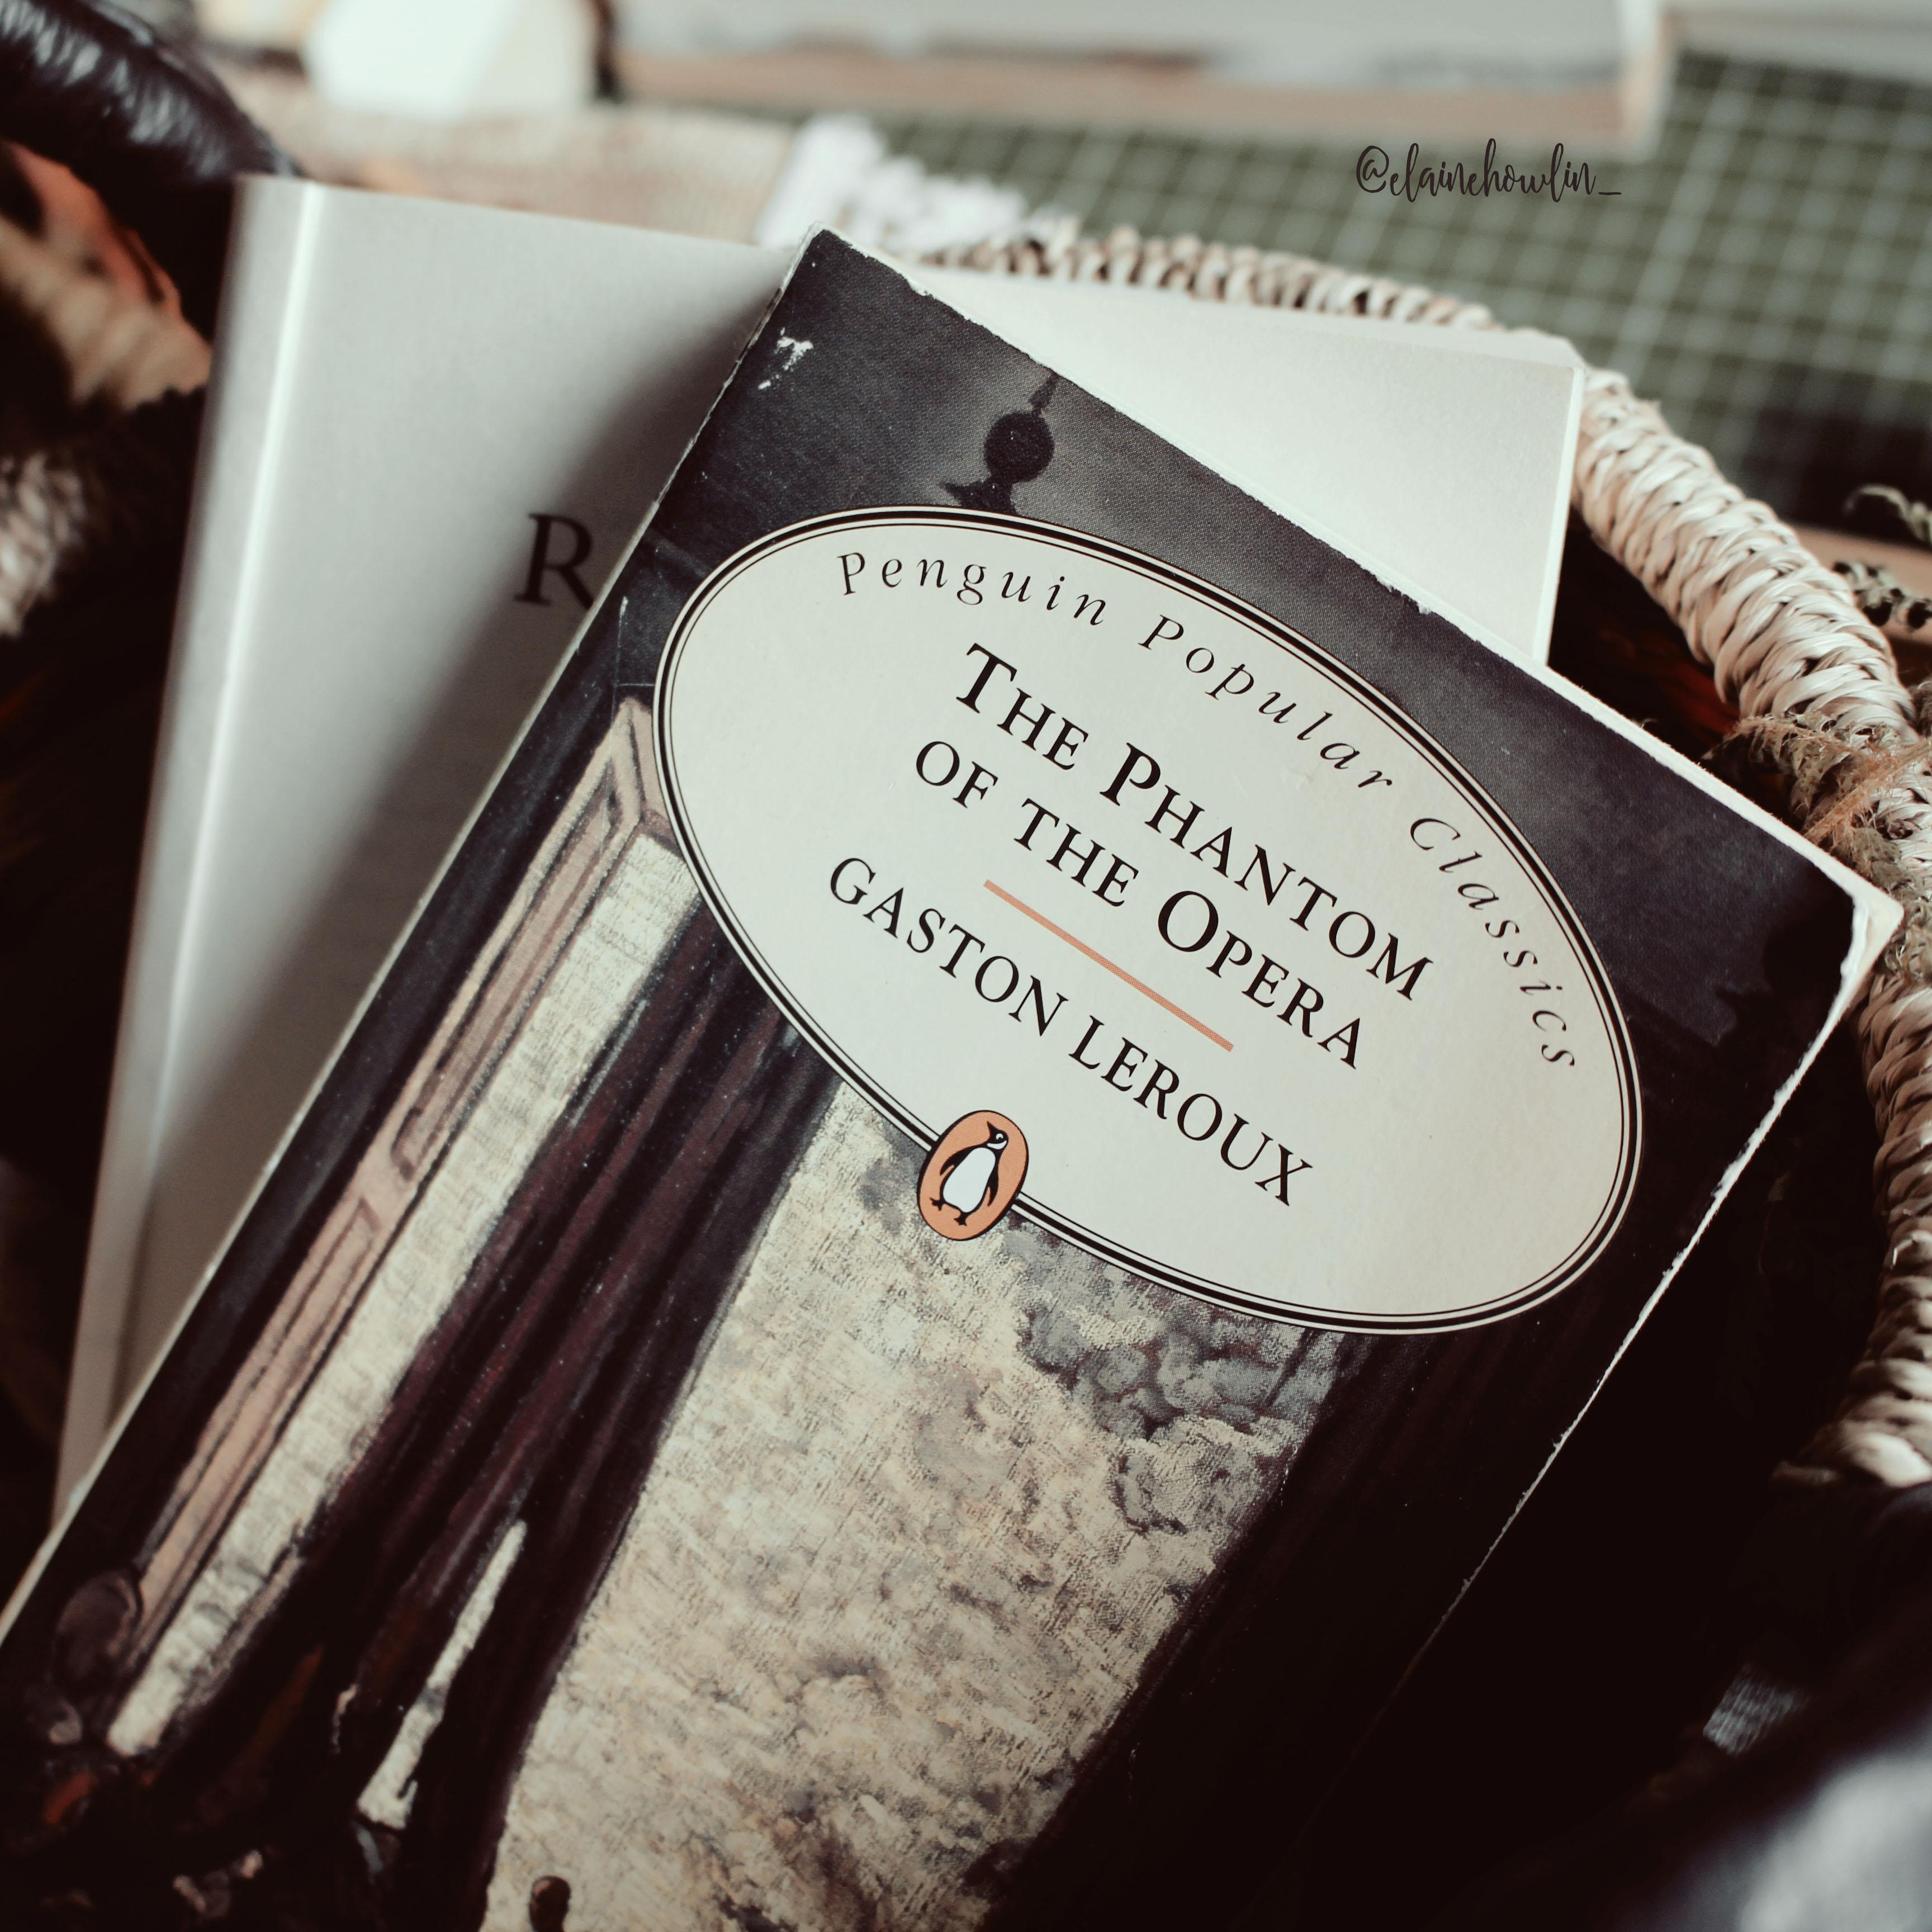 The Phantom of the Opera by Gaston Leroux Elaine Howlin Book Blog